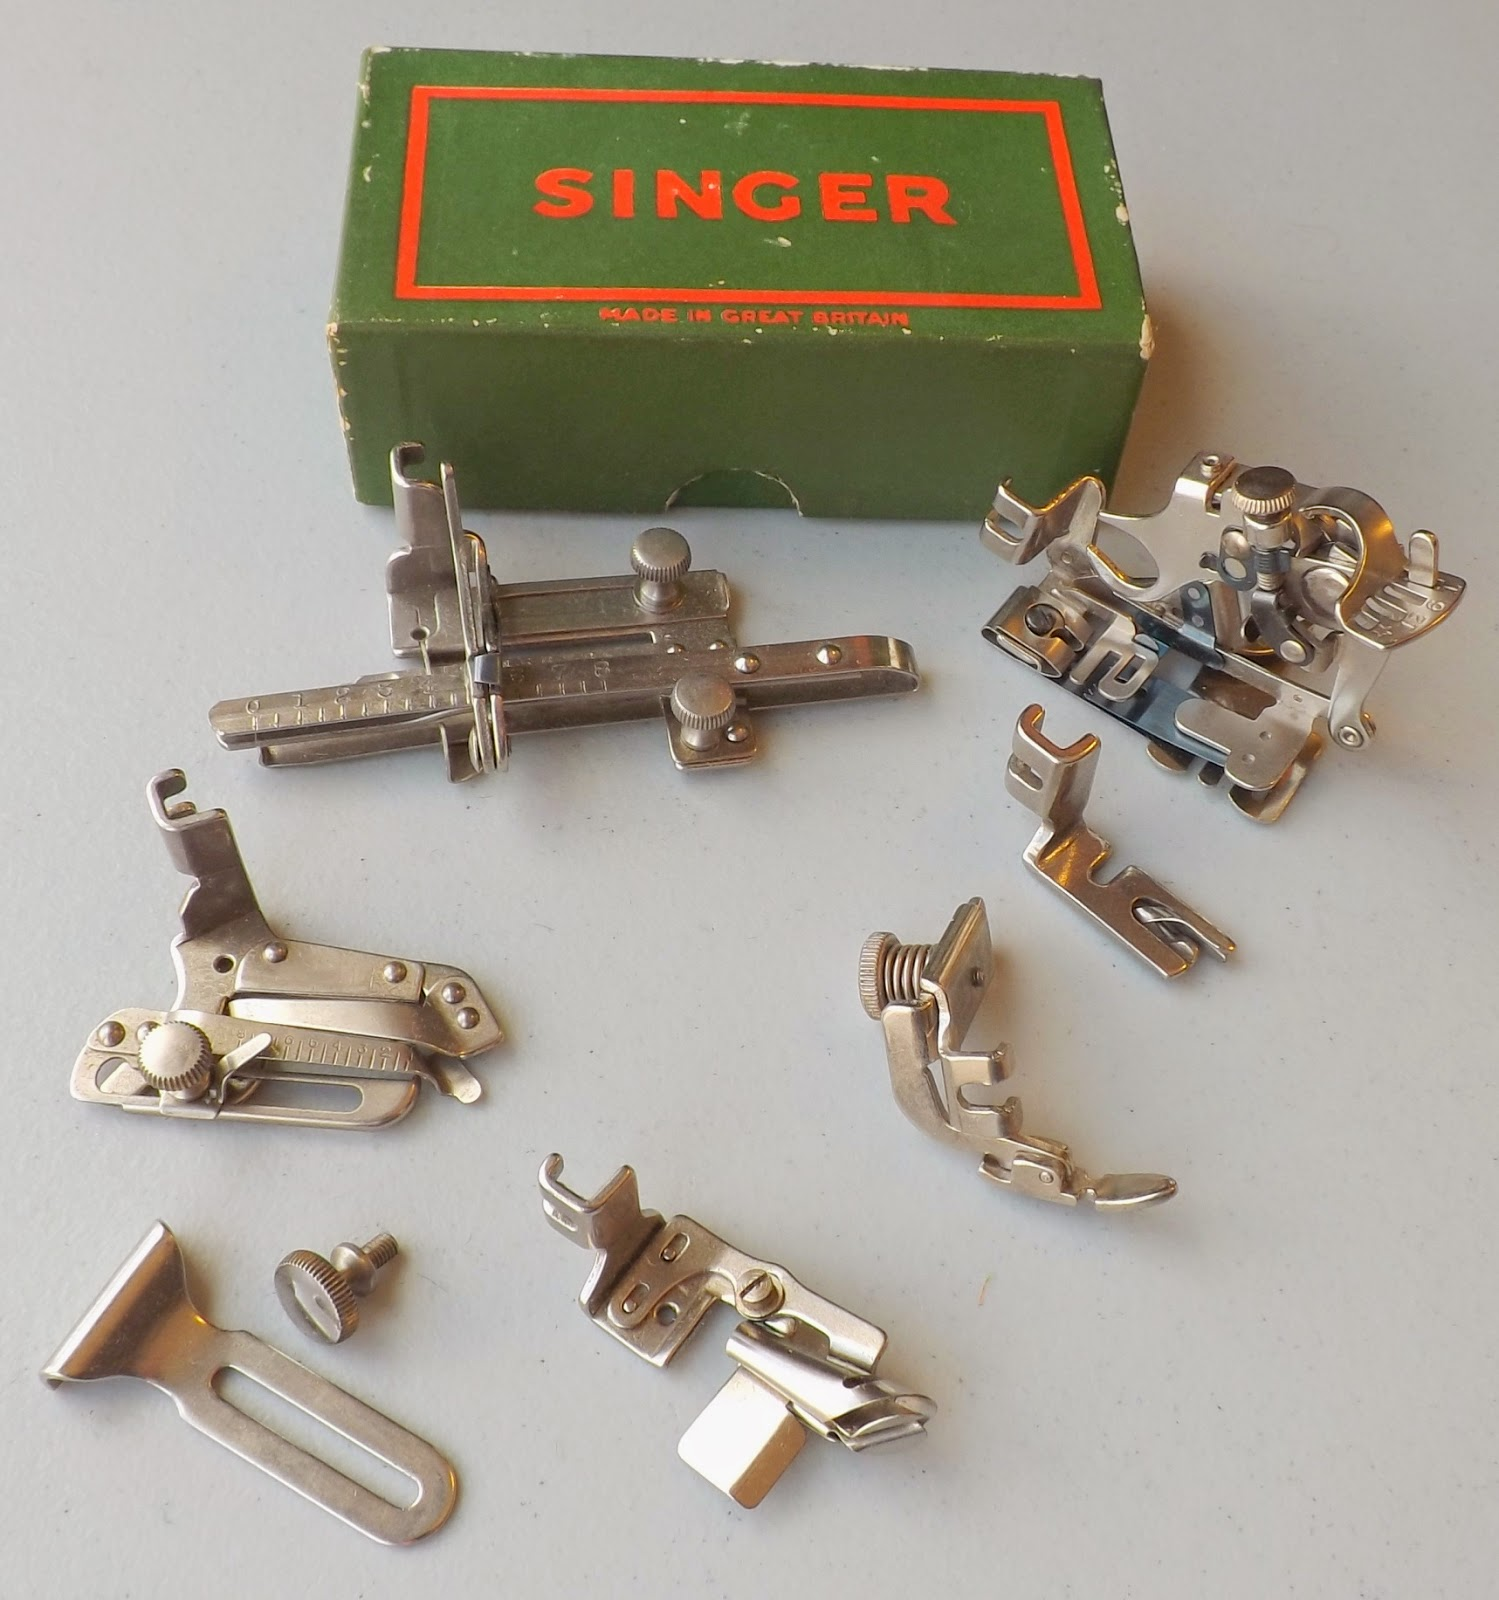 Singer sewing machine antique dating 4